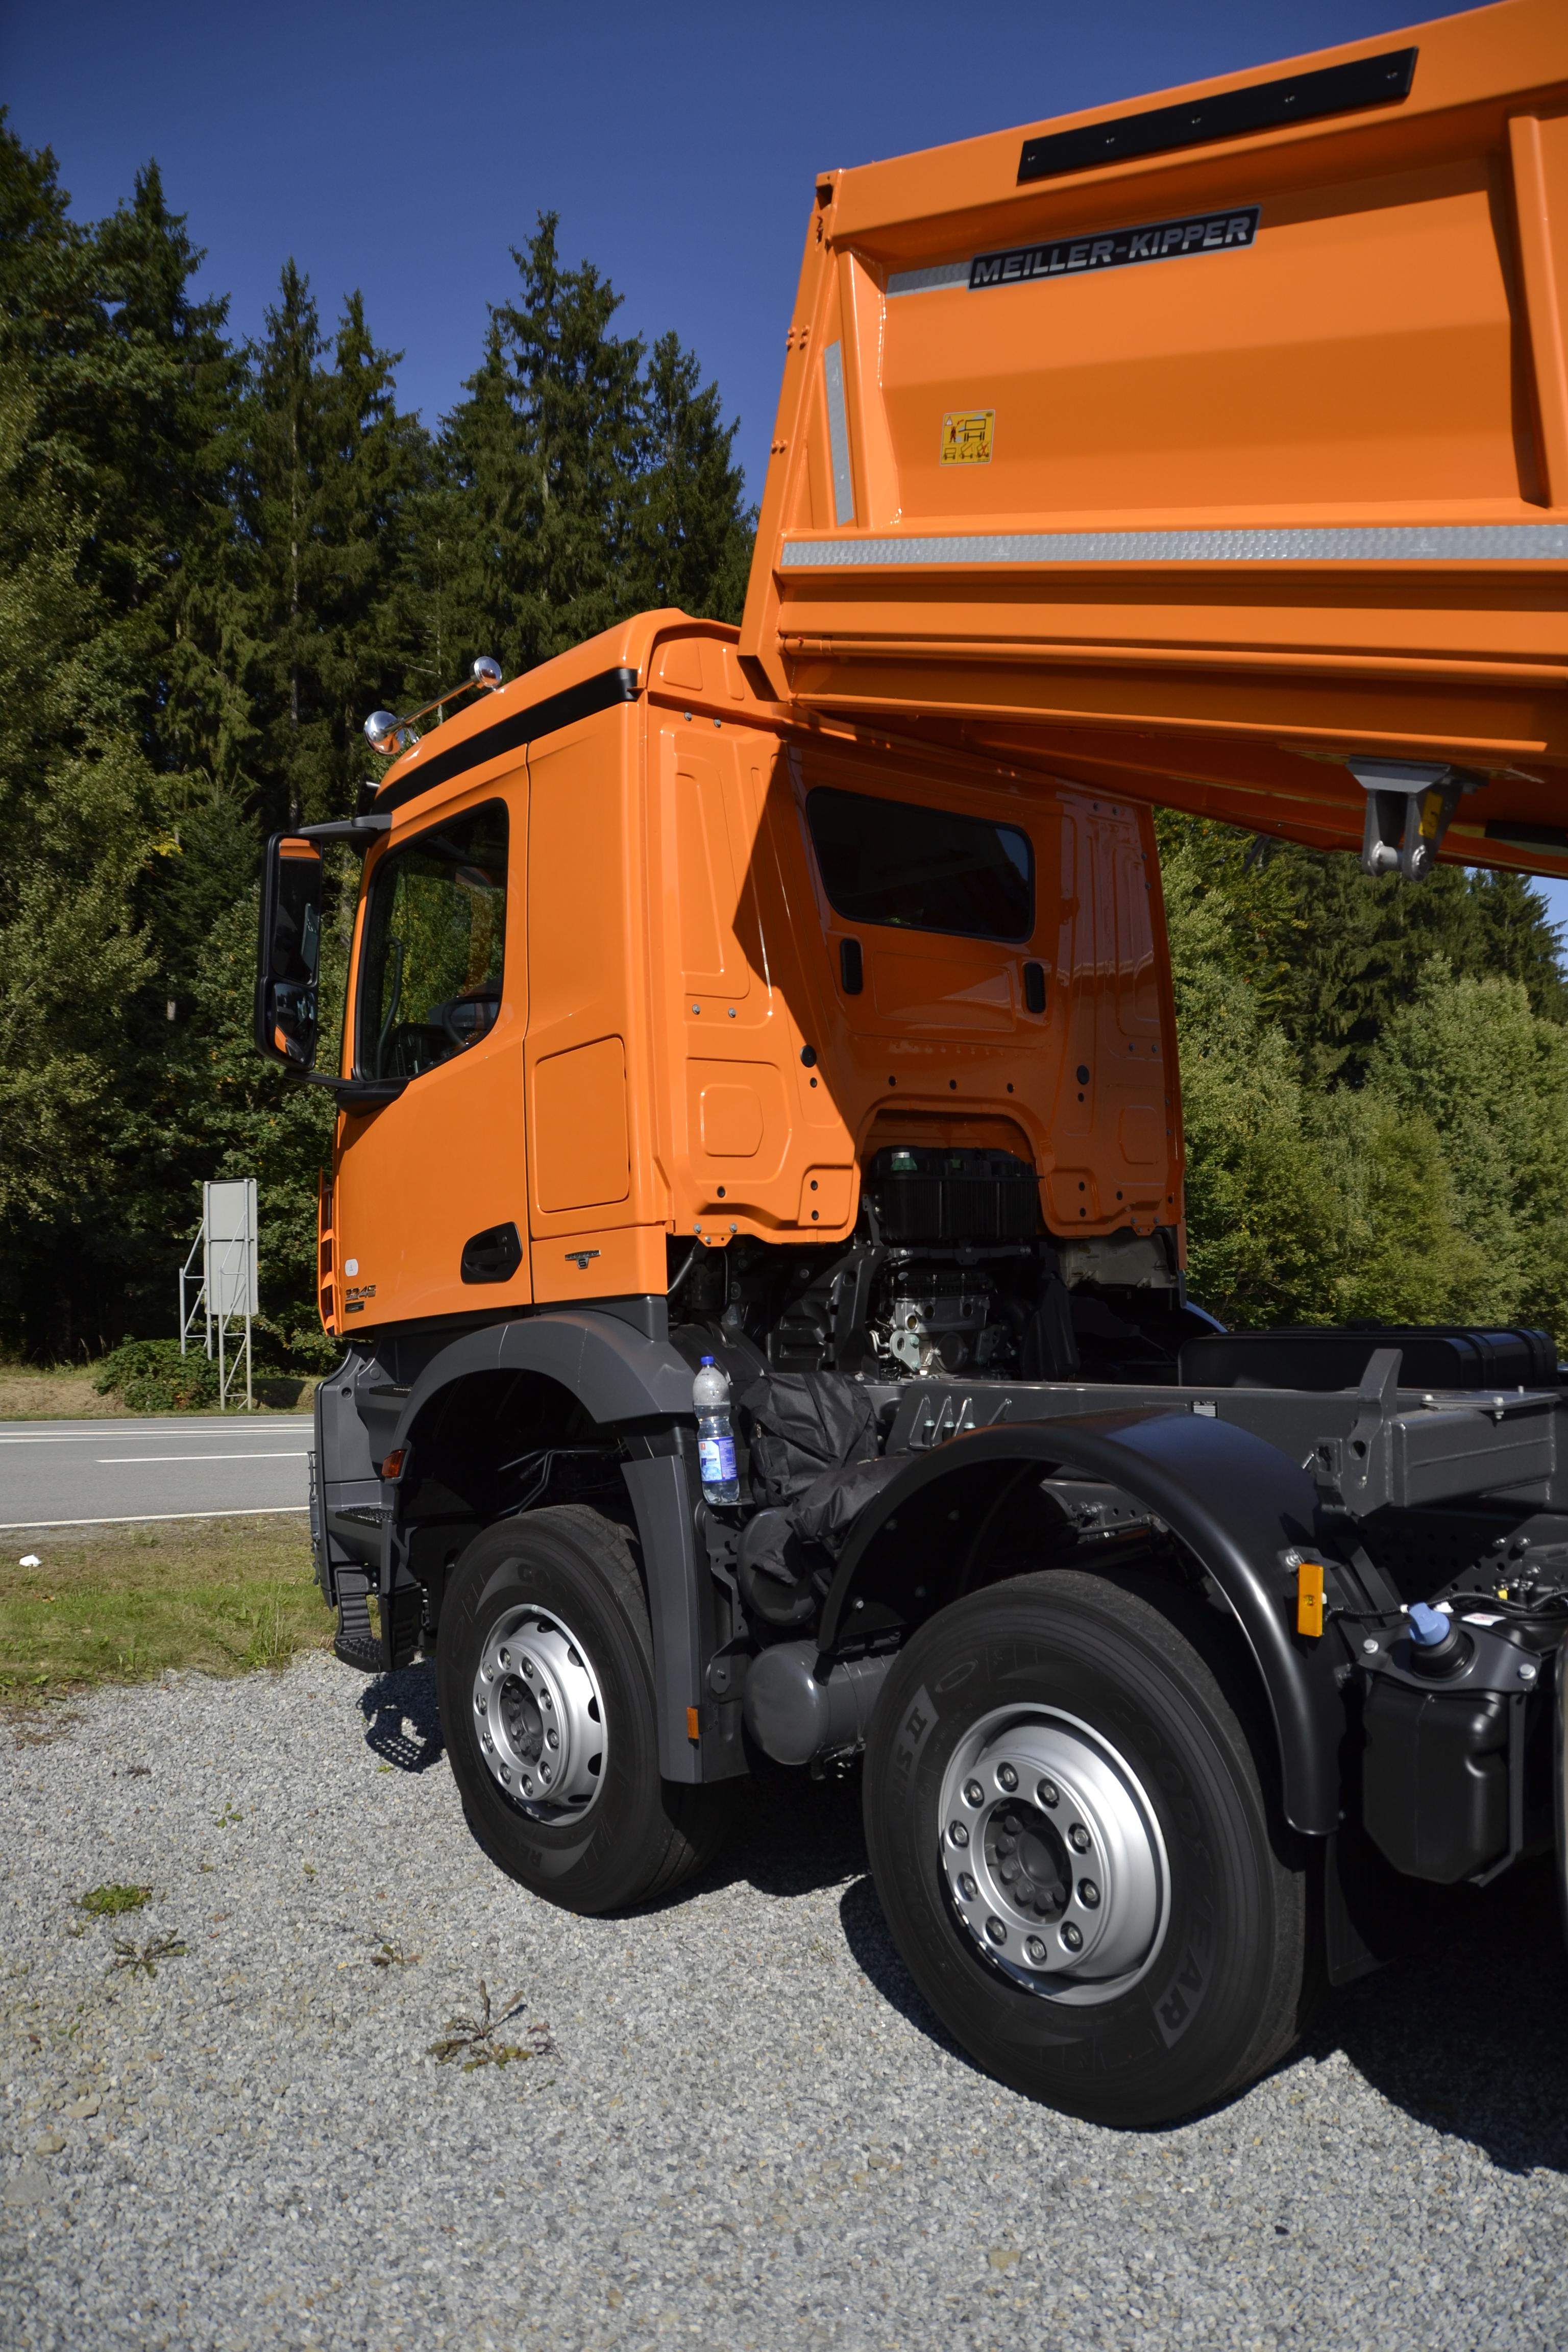 File Mercedes Benz Arocs dump truck version 2 JPG